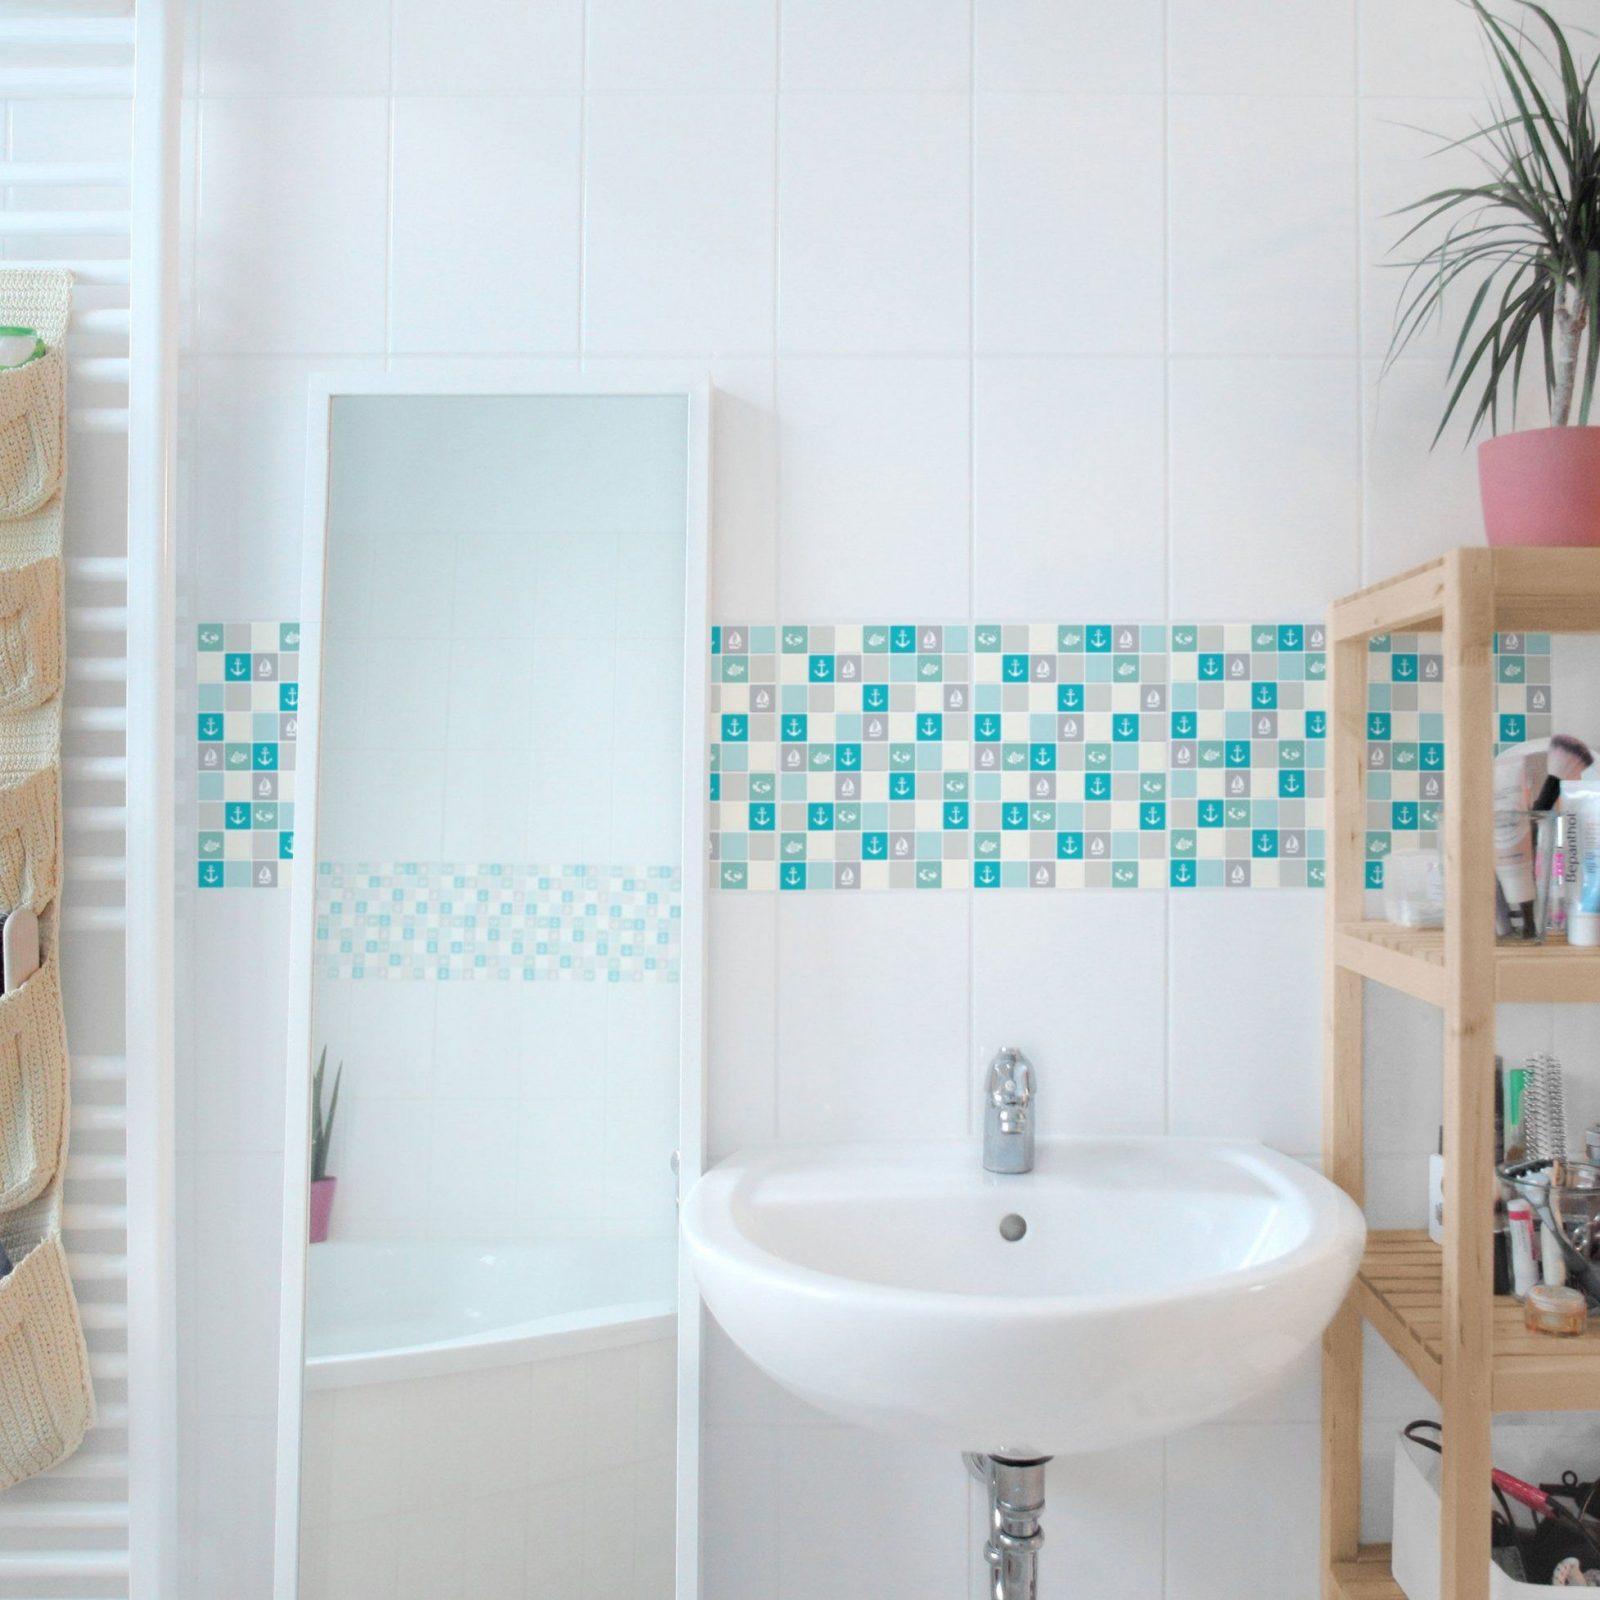 Badezimmer Mosaik Fliesen Turkis Bunte Mosaikfliesen Bilder Ideen